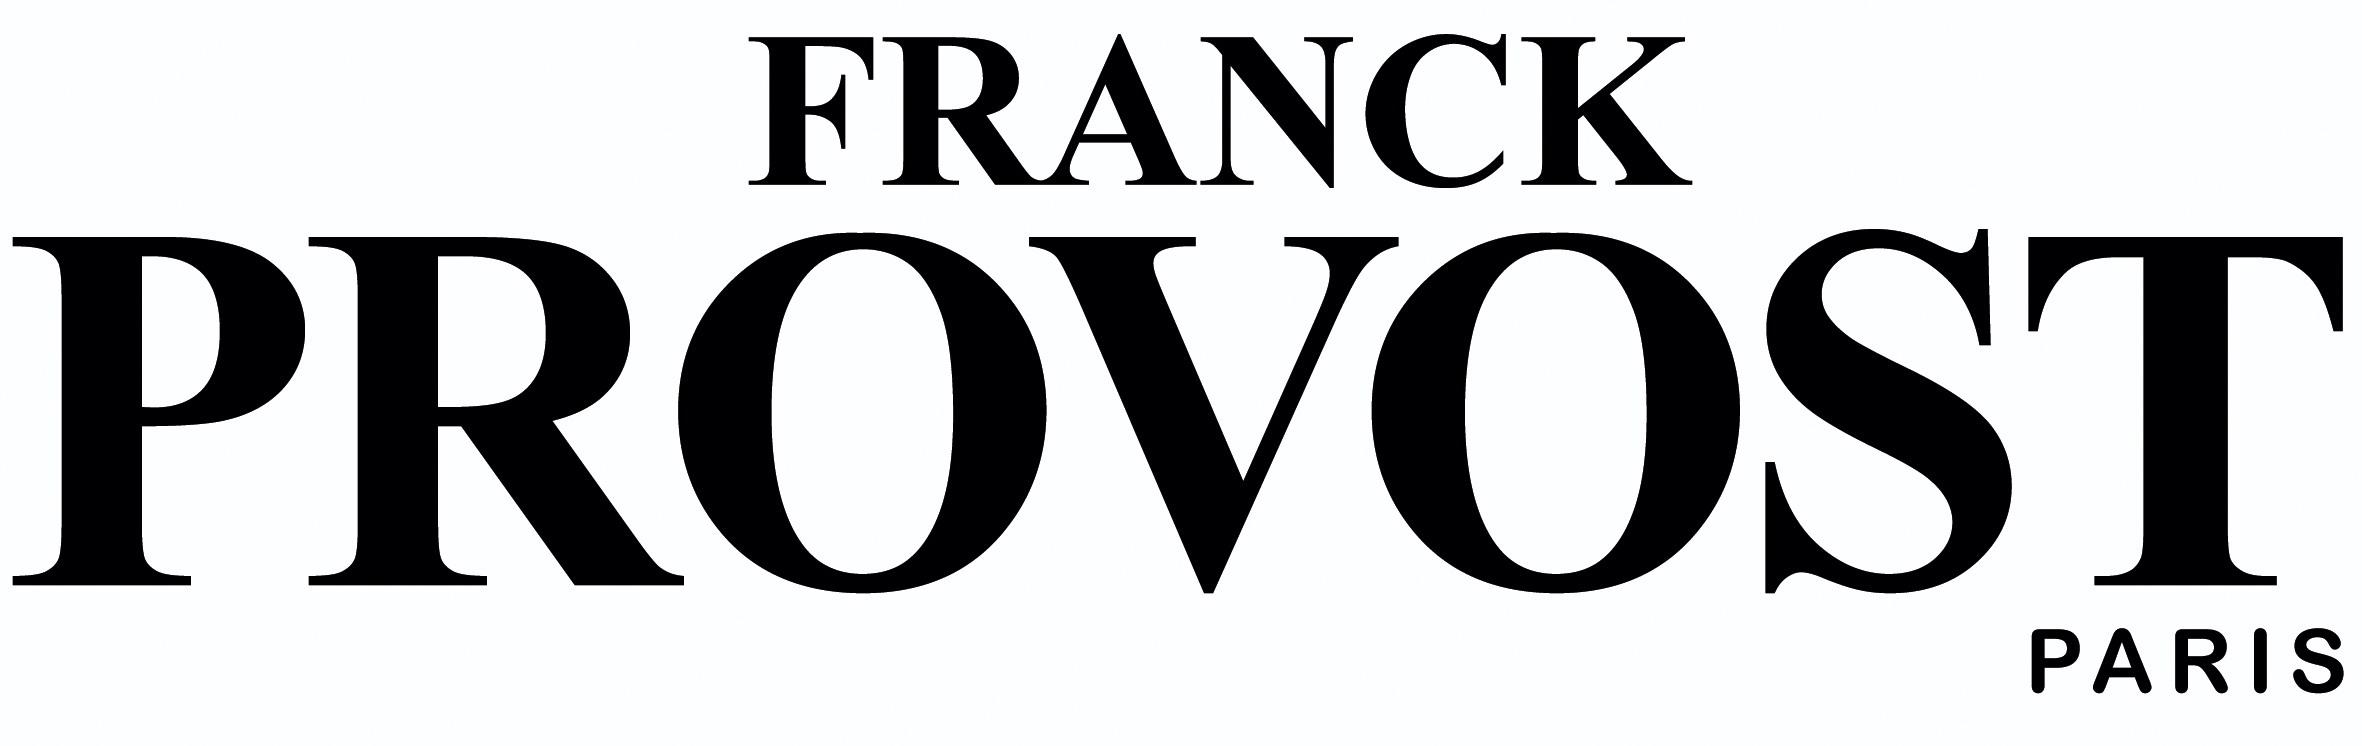 Franck provost salon de provence avis tarifs horaires for Tarif salon franck provost